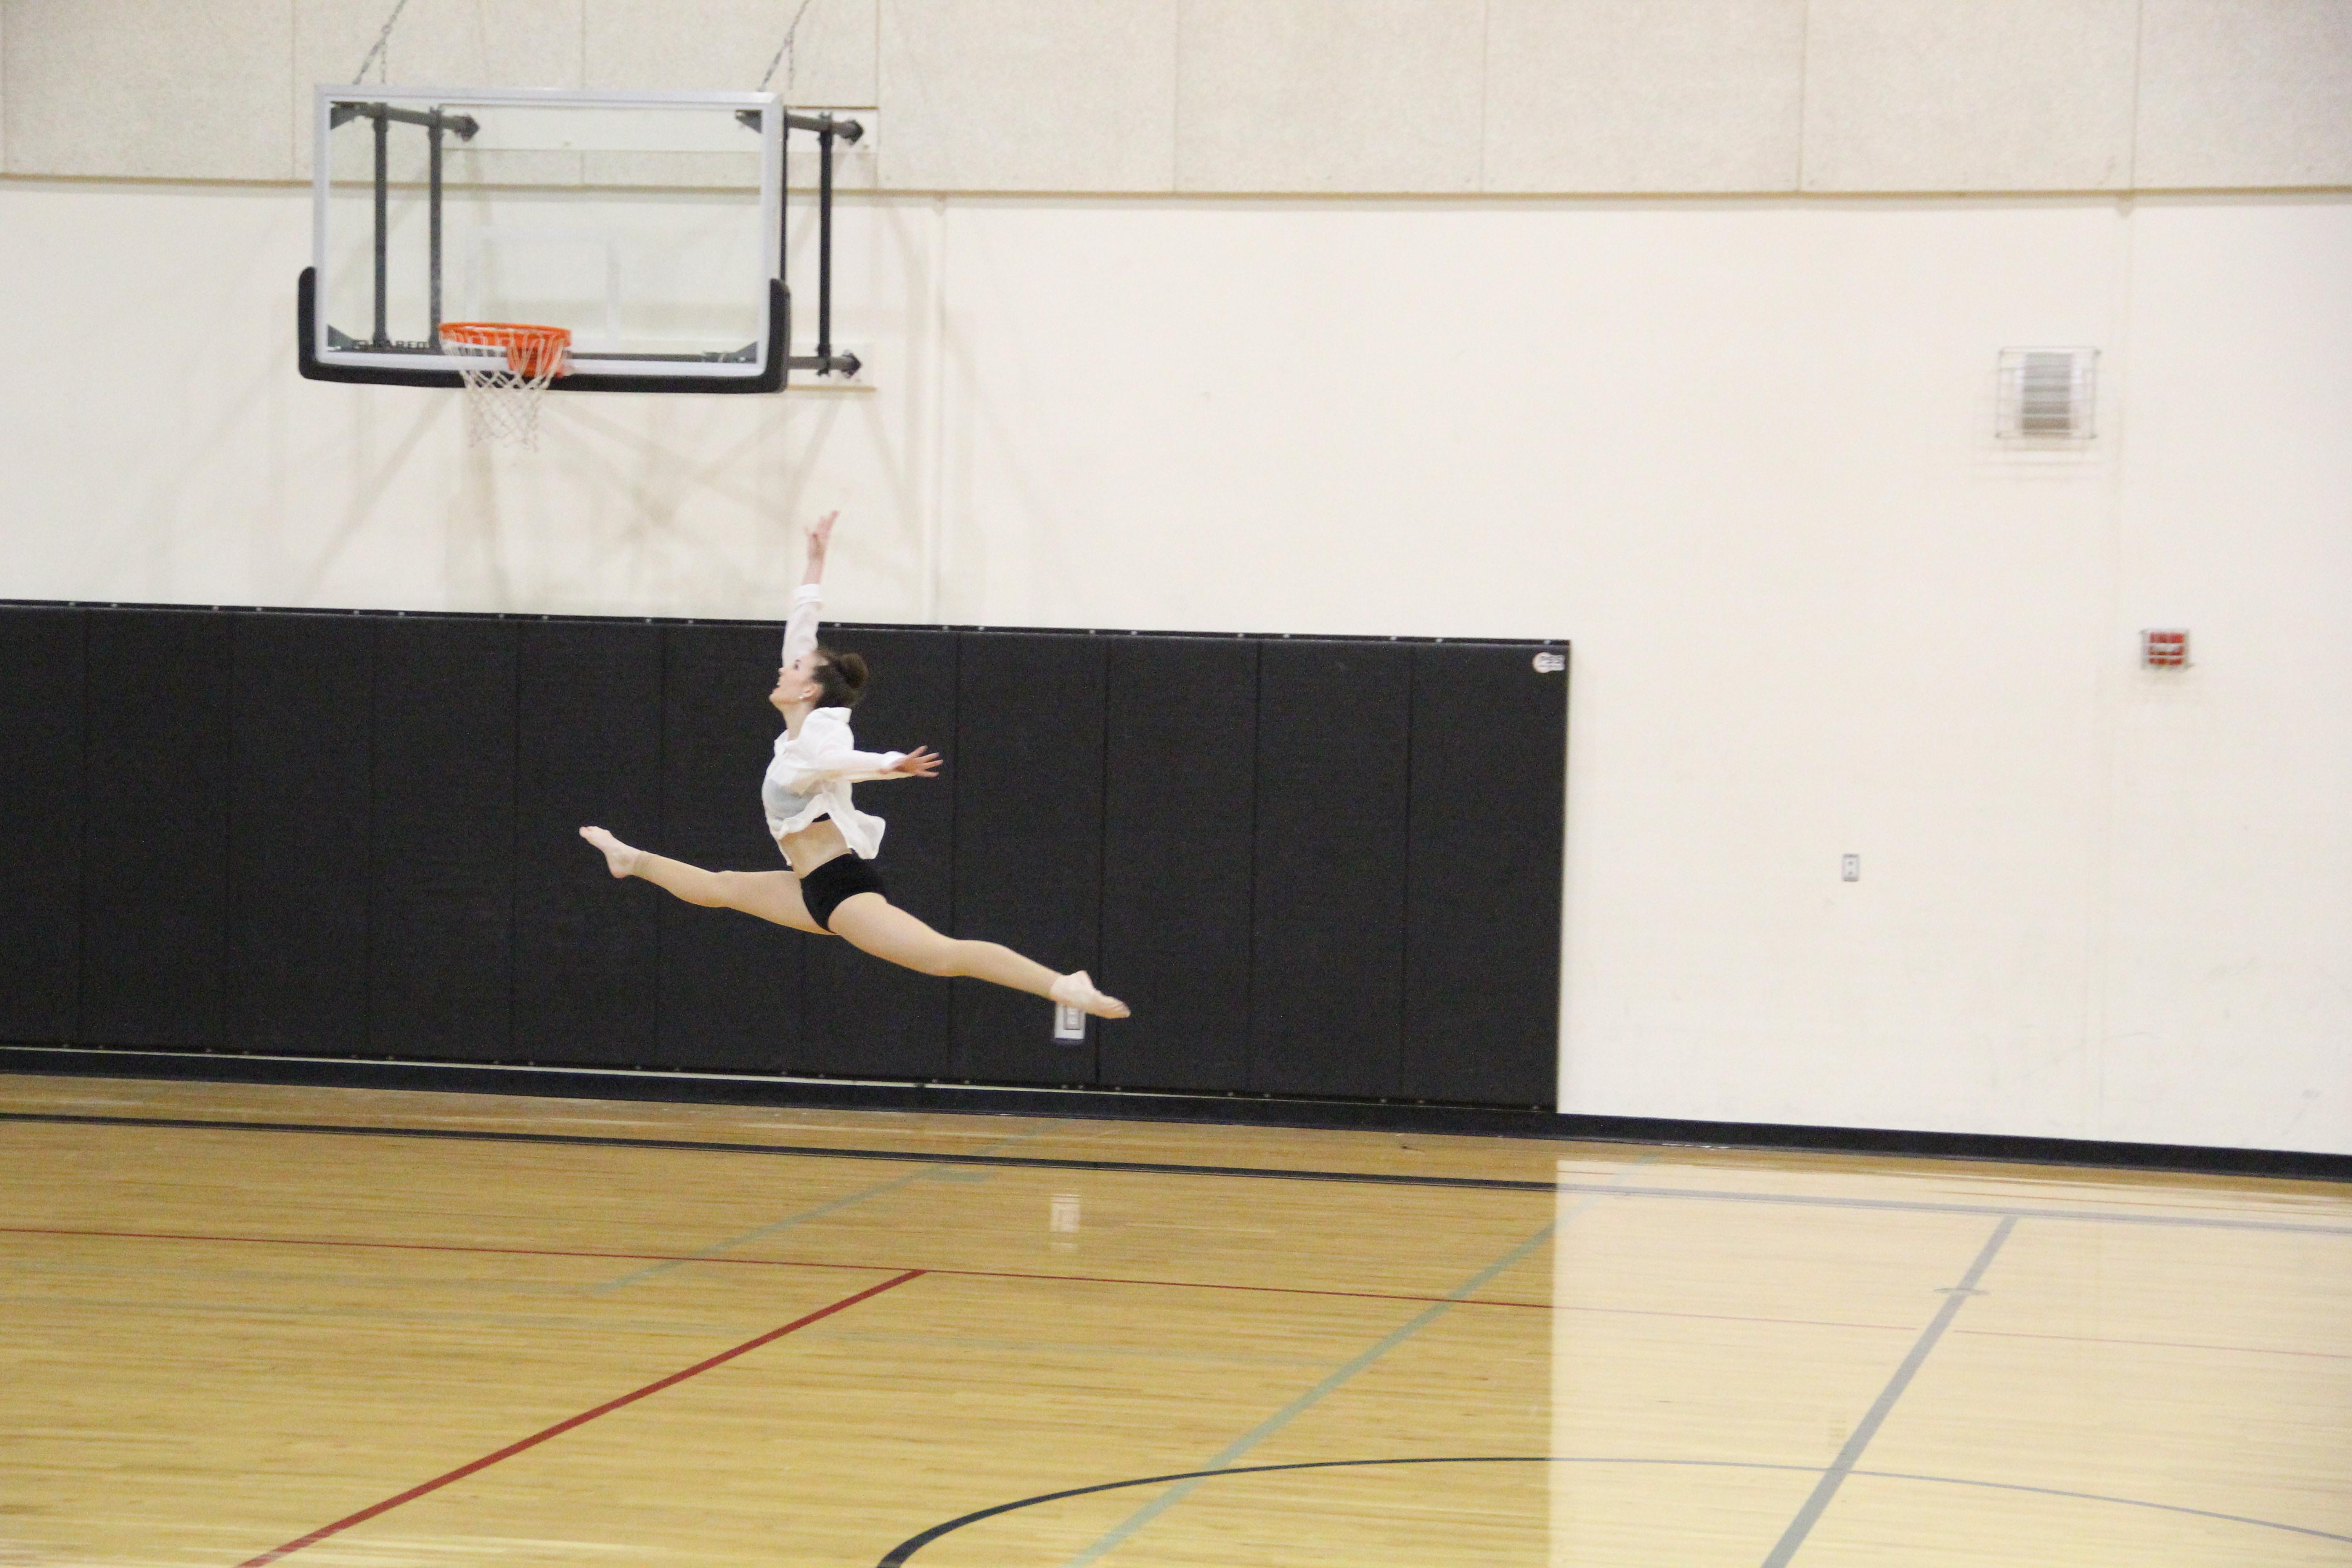 Paige D leap highschool modern 2017